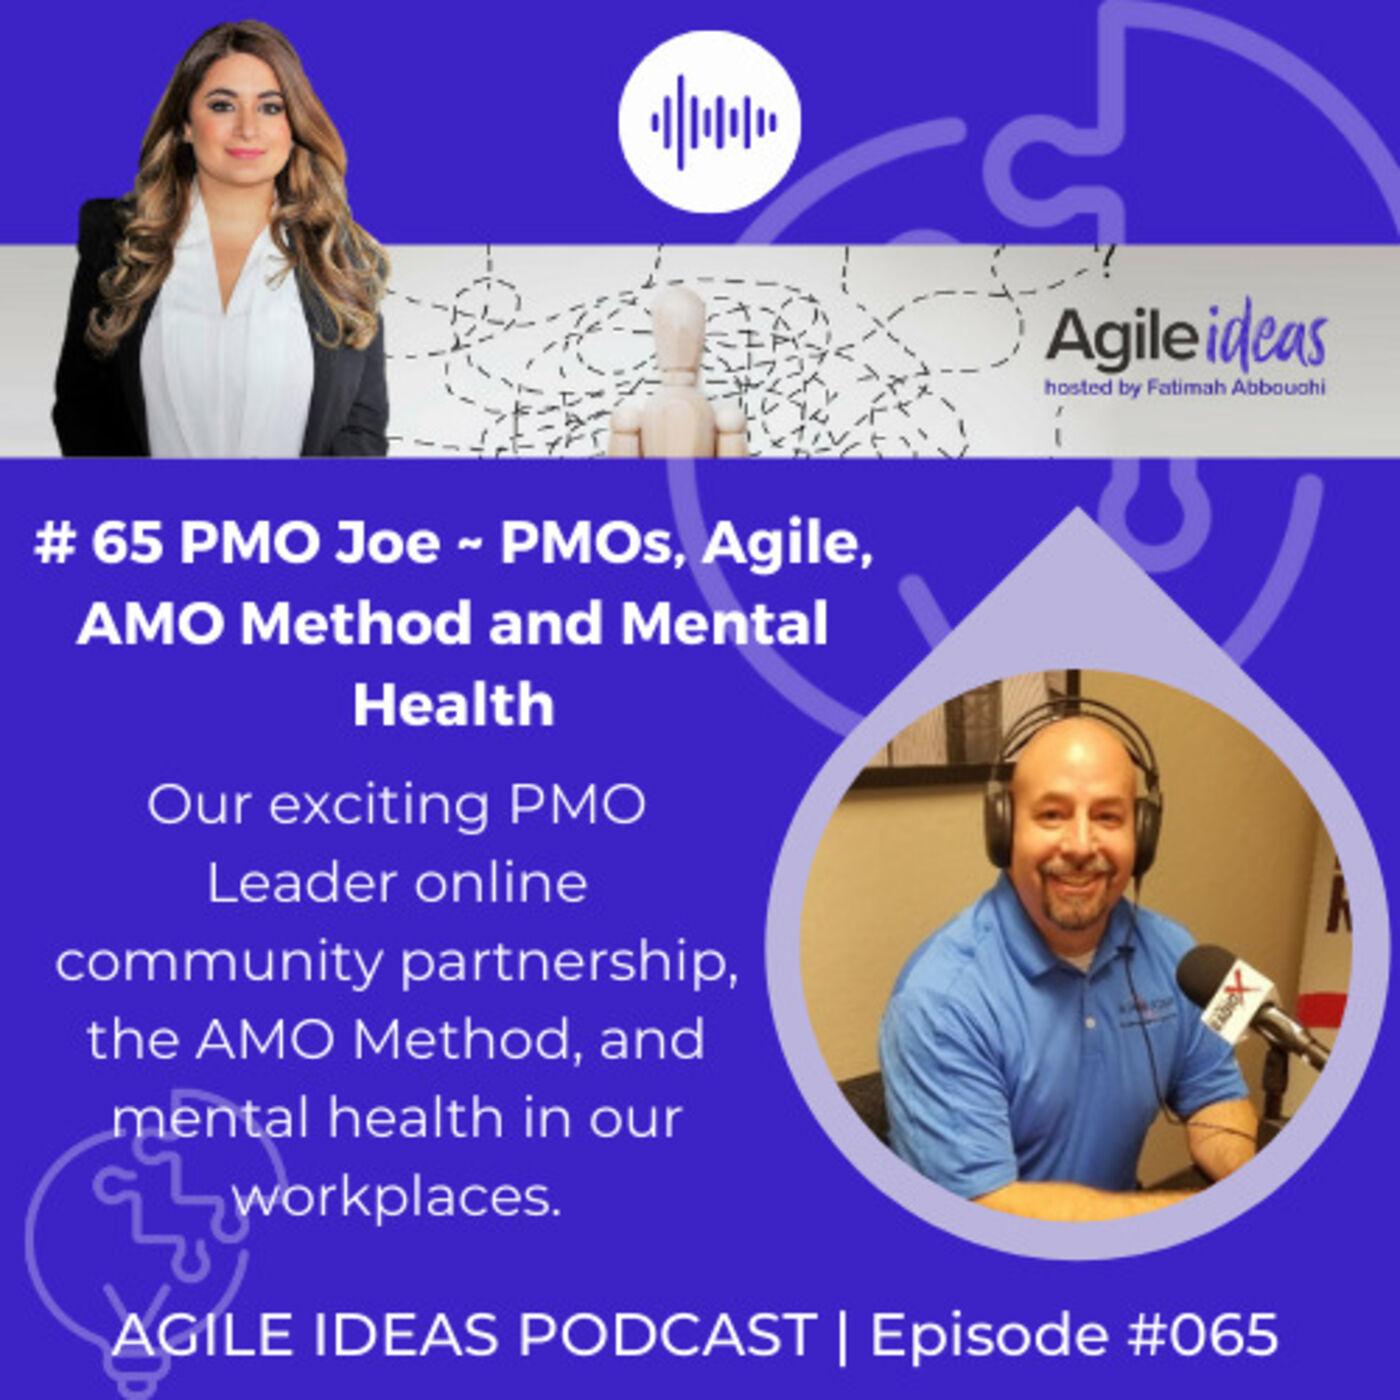 #065   PMO Joe - on PMOs, Agile, AMO Method and Mental Health